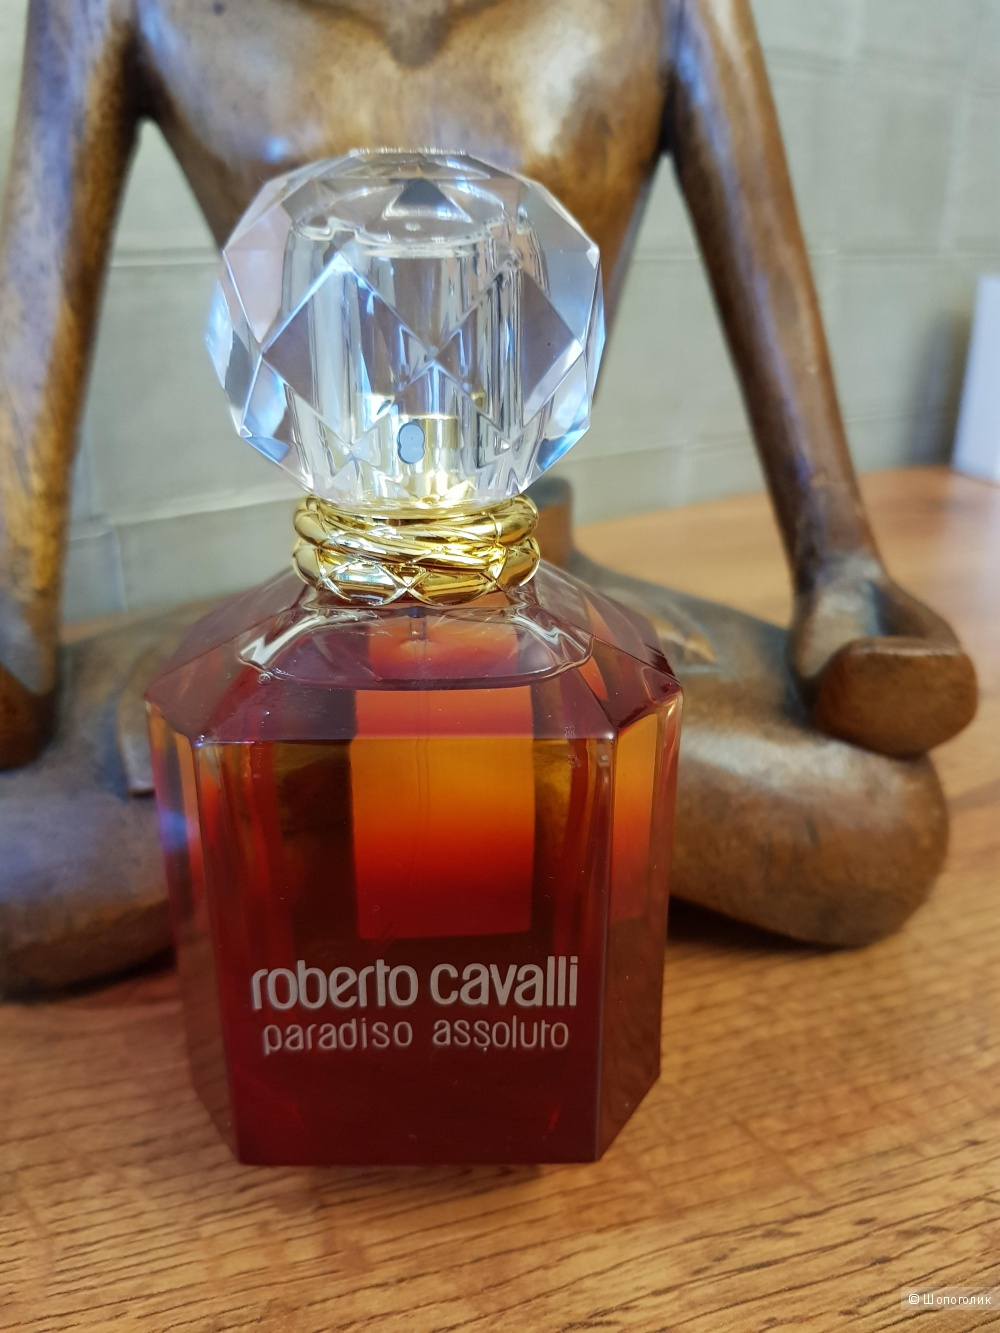 Roberto cavalli paradiso assoluto, EDP, 75 ml